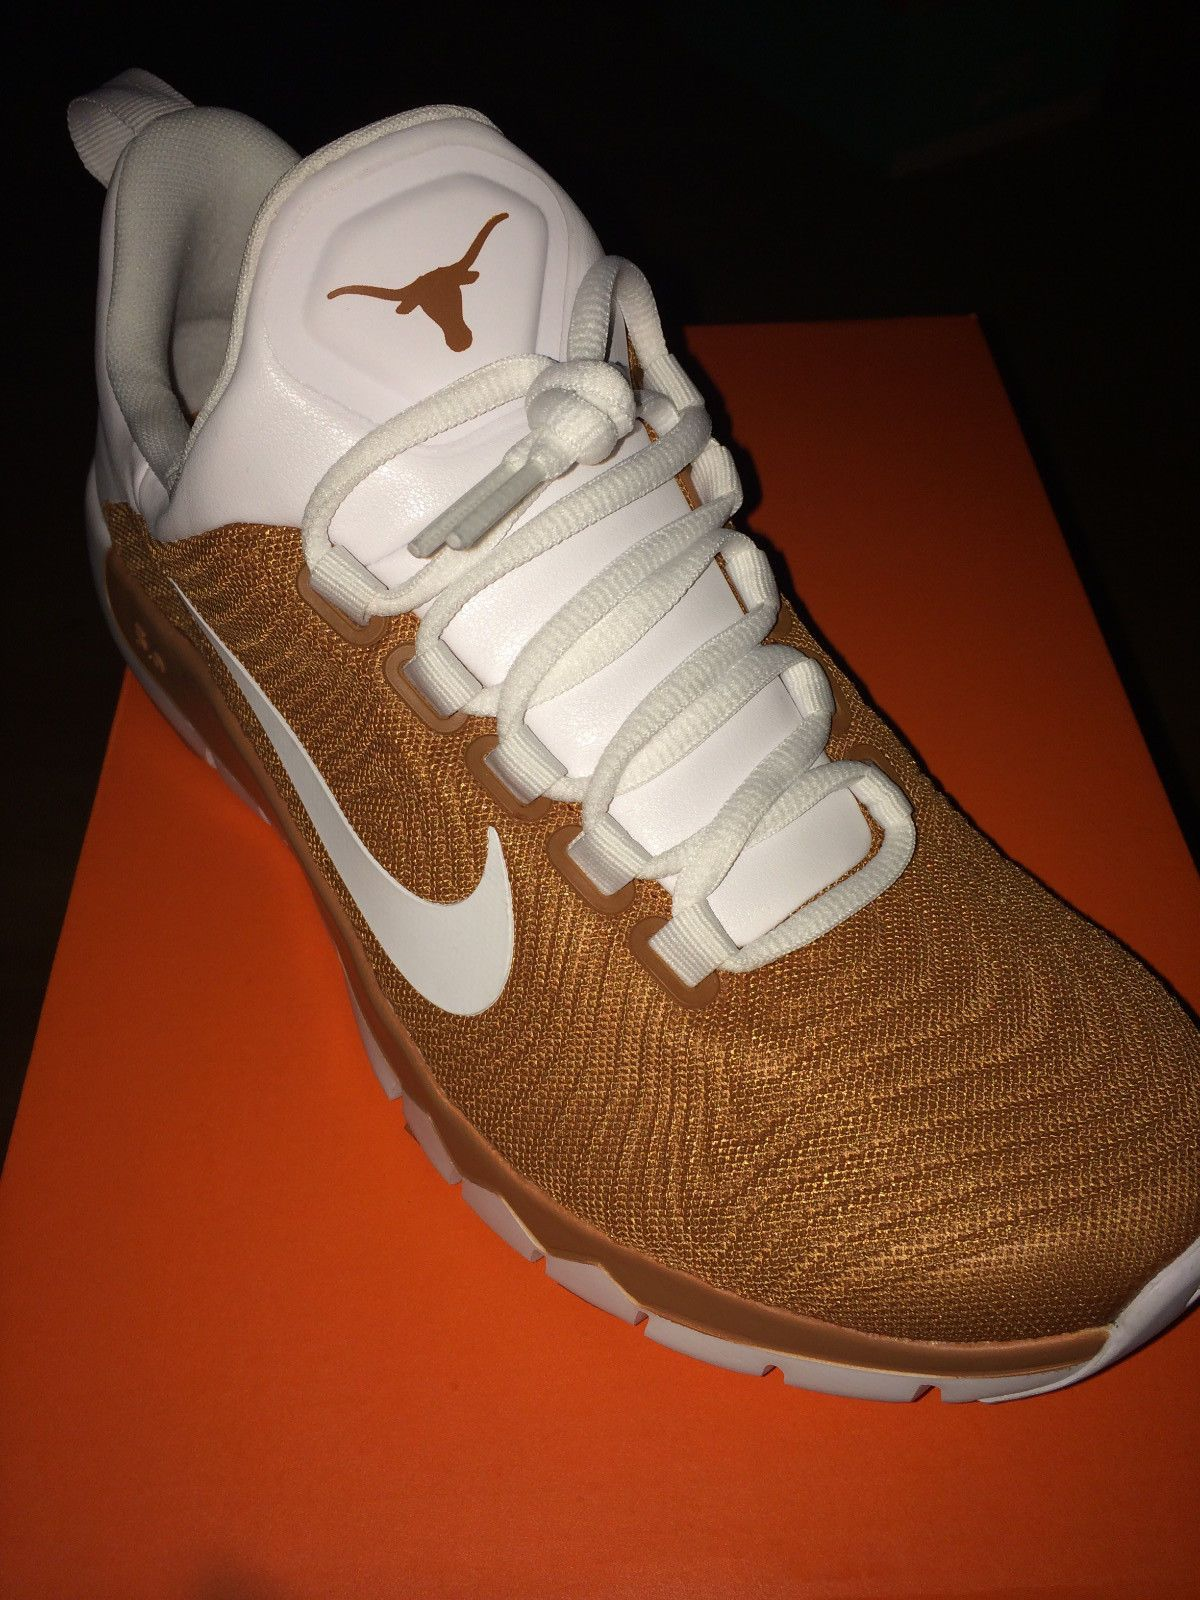 air nike shoes longhorns logos 841050